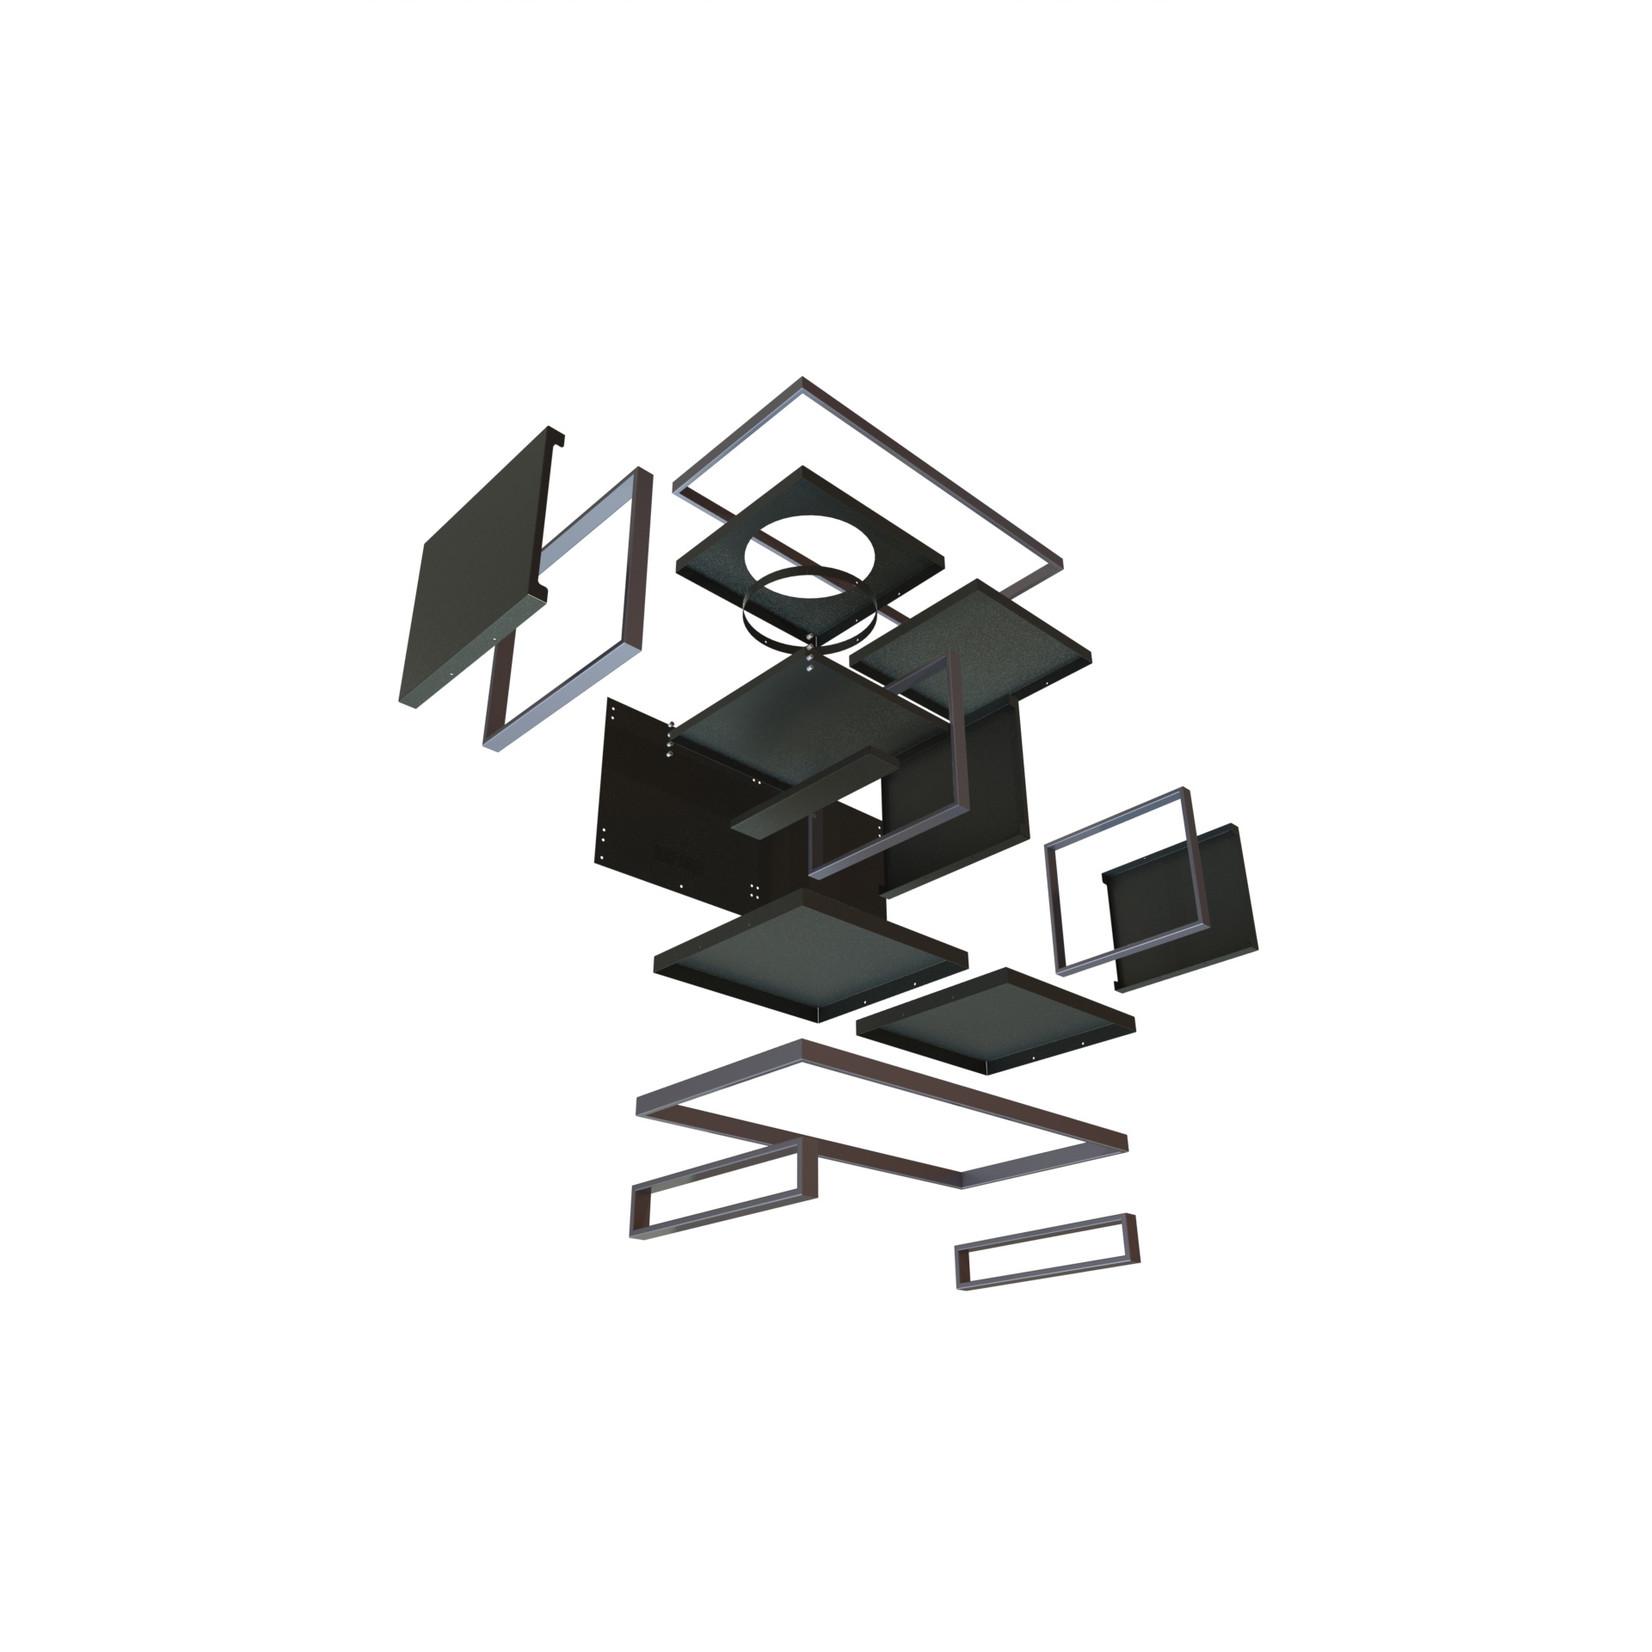 Roostr Rubix Duo Frame